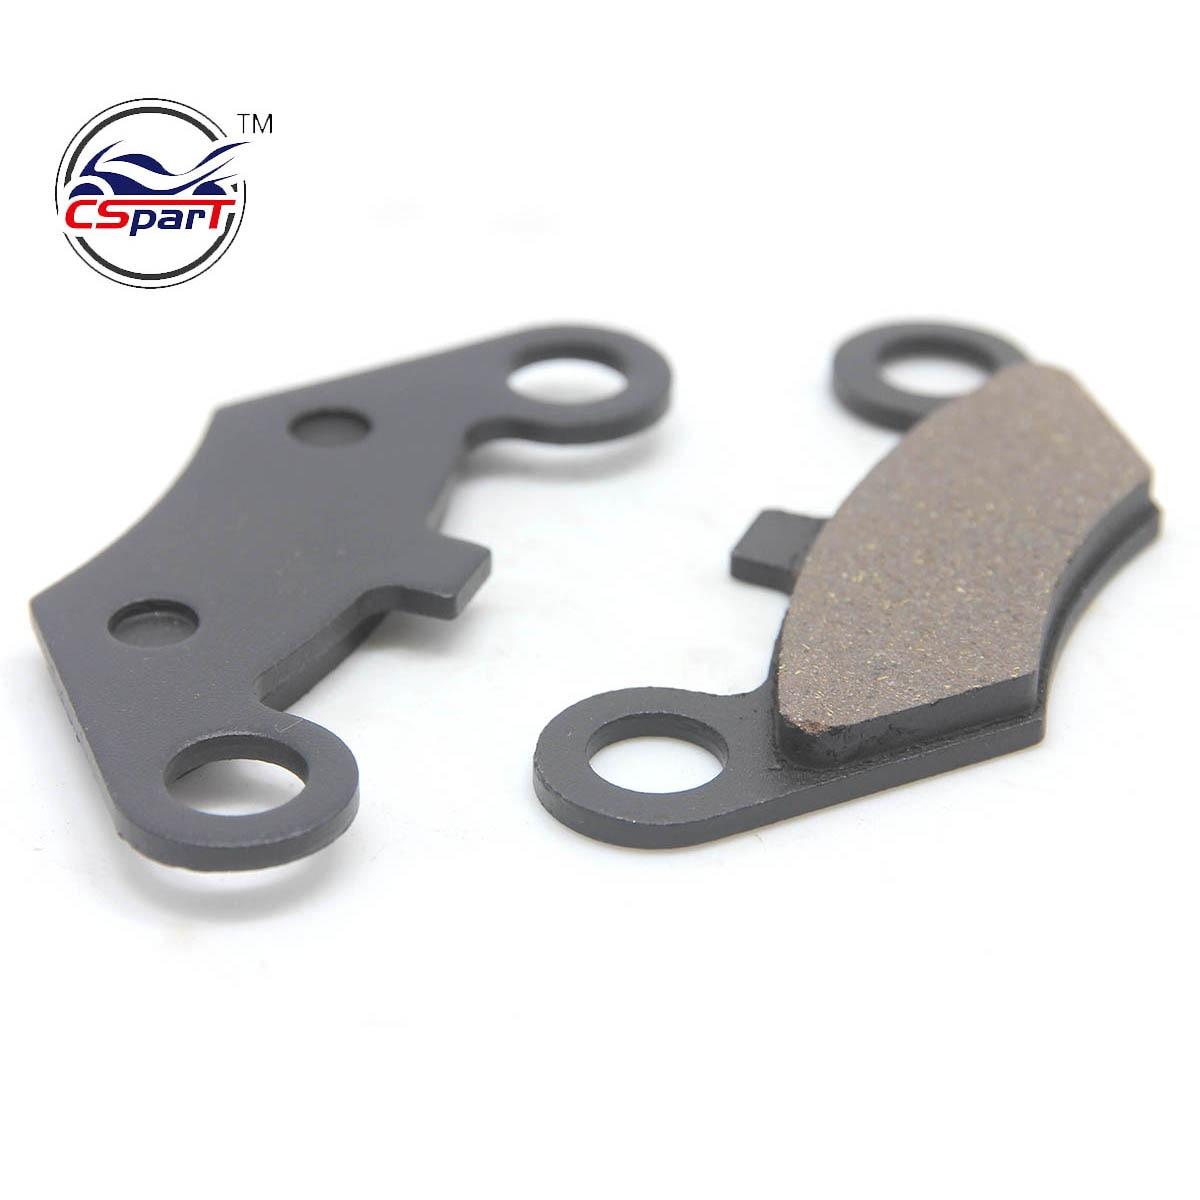 1 SET Front Brake Pad For CFmoto CF500 CFORCE 450 550 600 800 X5 X6 X8 400CC 500CC 600CC 800CC ATV 9010-080810 0808B0 0808A0